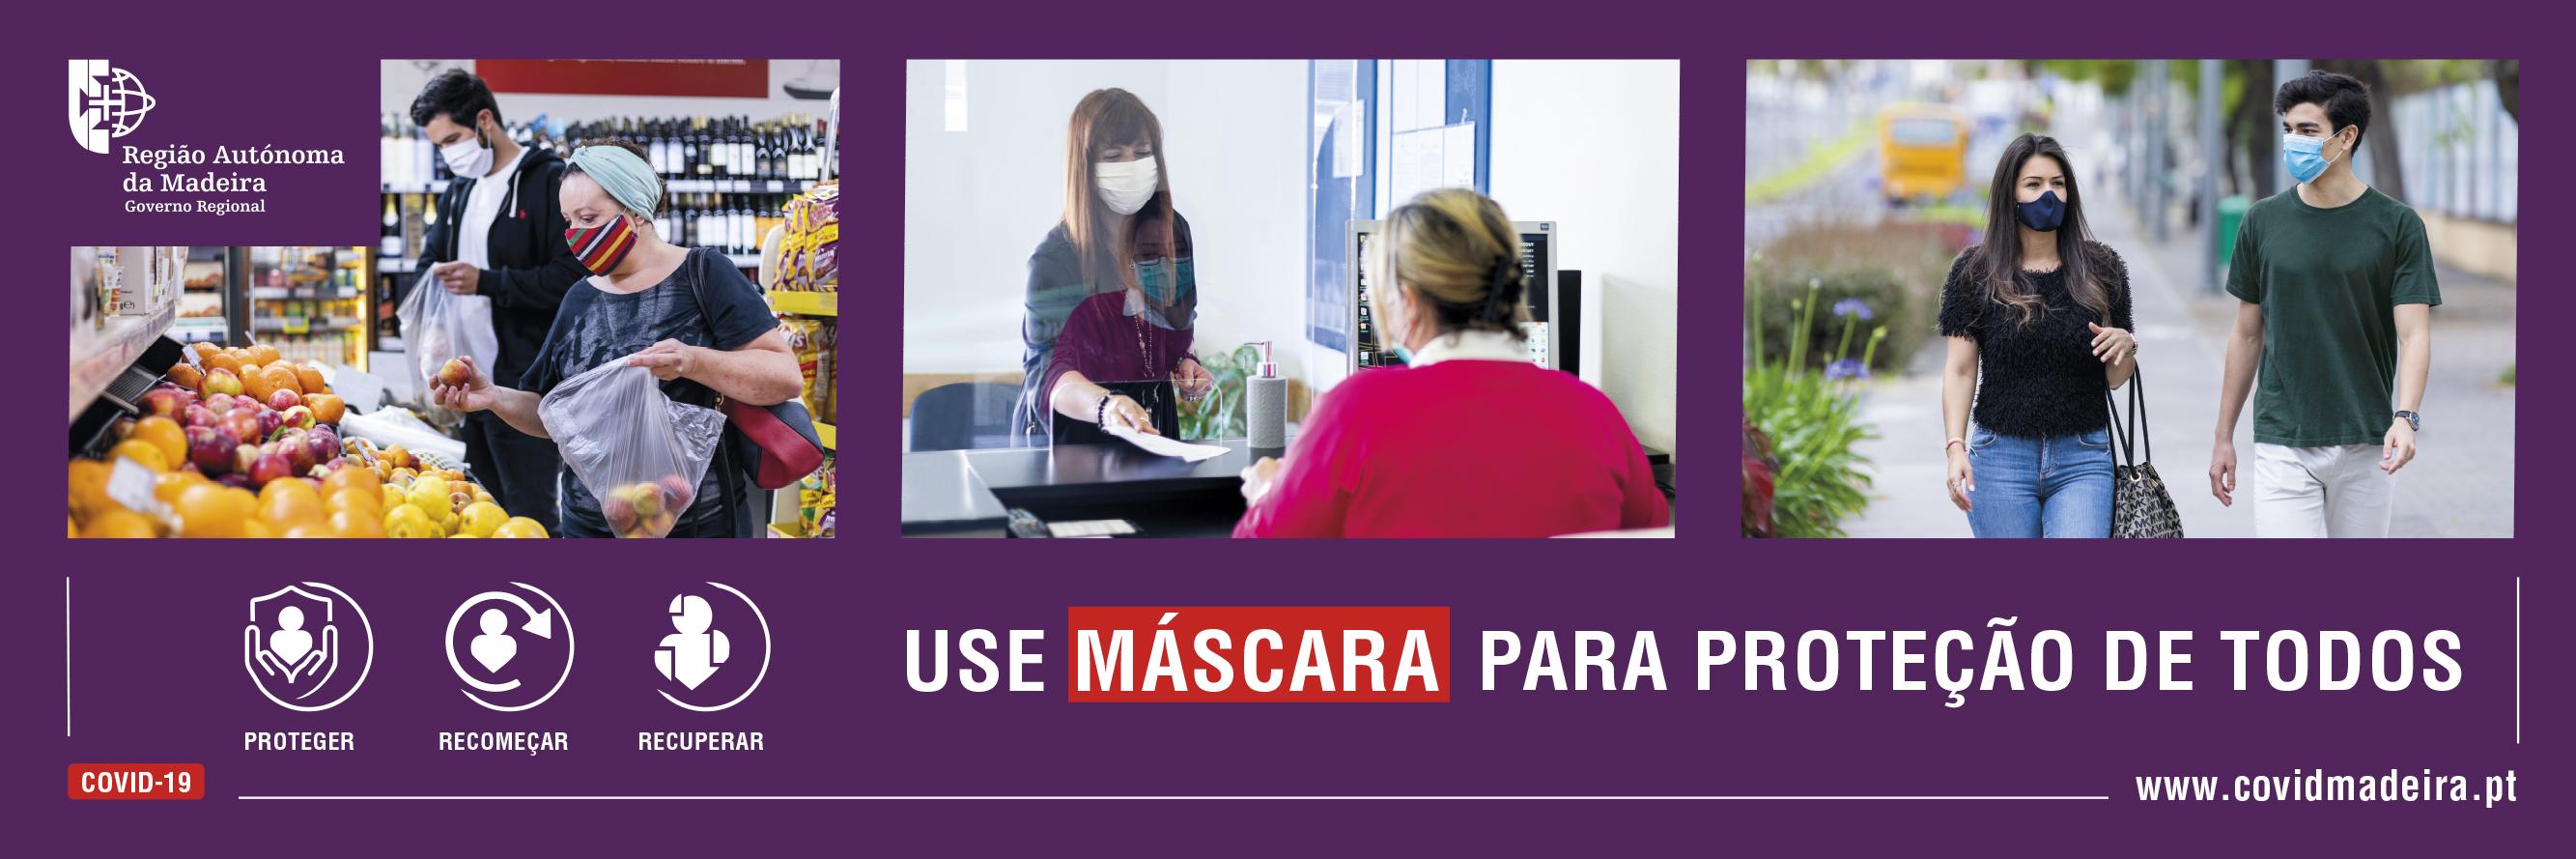 Use Máscara para proteção de todos